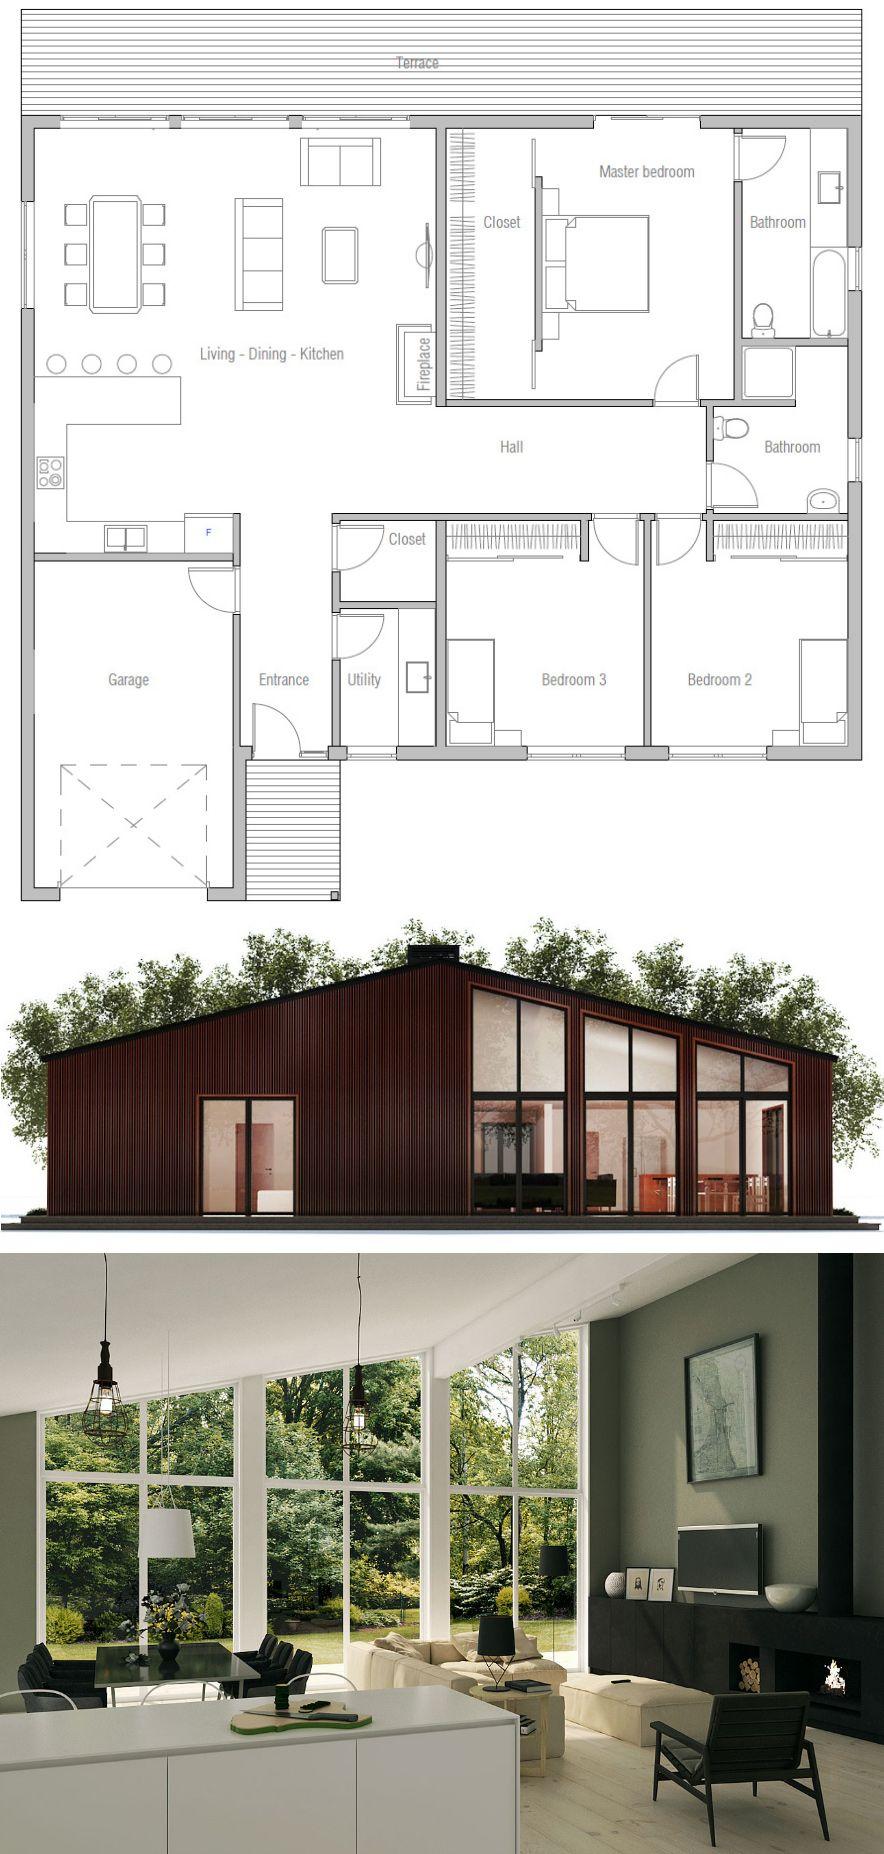 Inspiration plan maison moderne httpwww m